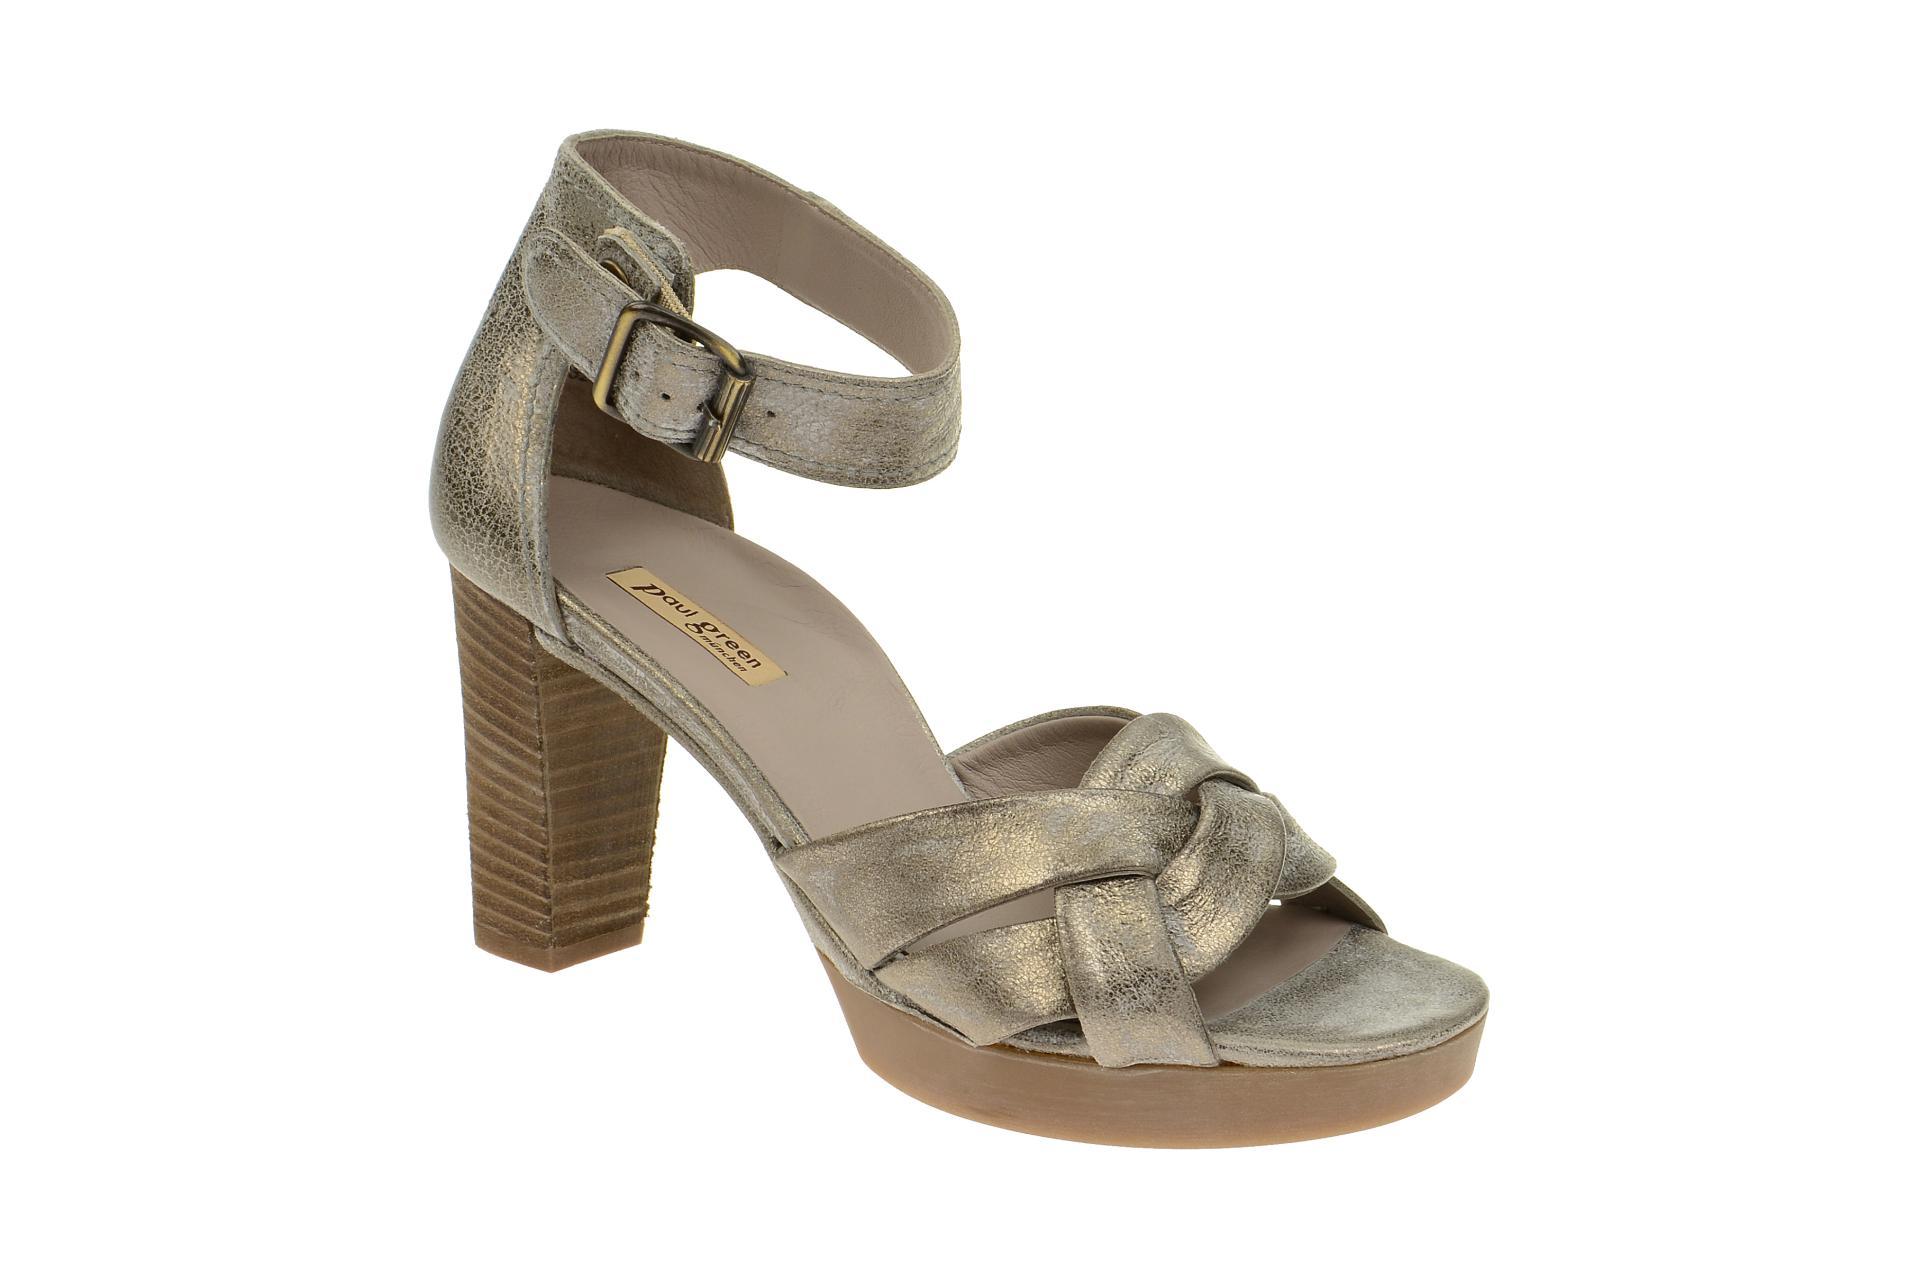 online store 9da24 c9ceb Paul Green Sandale 6958 grau metallic Gr 38,5